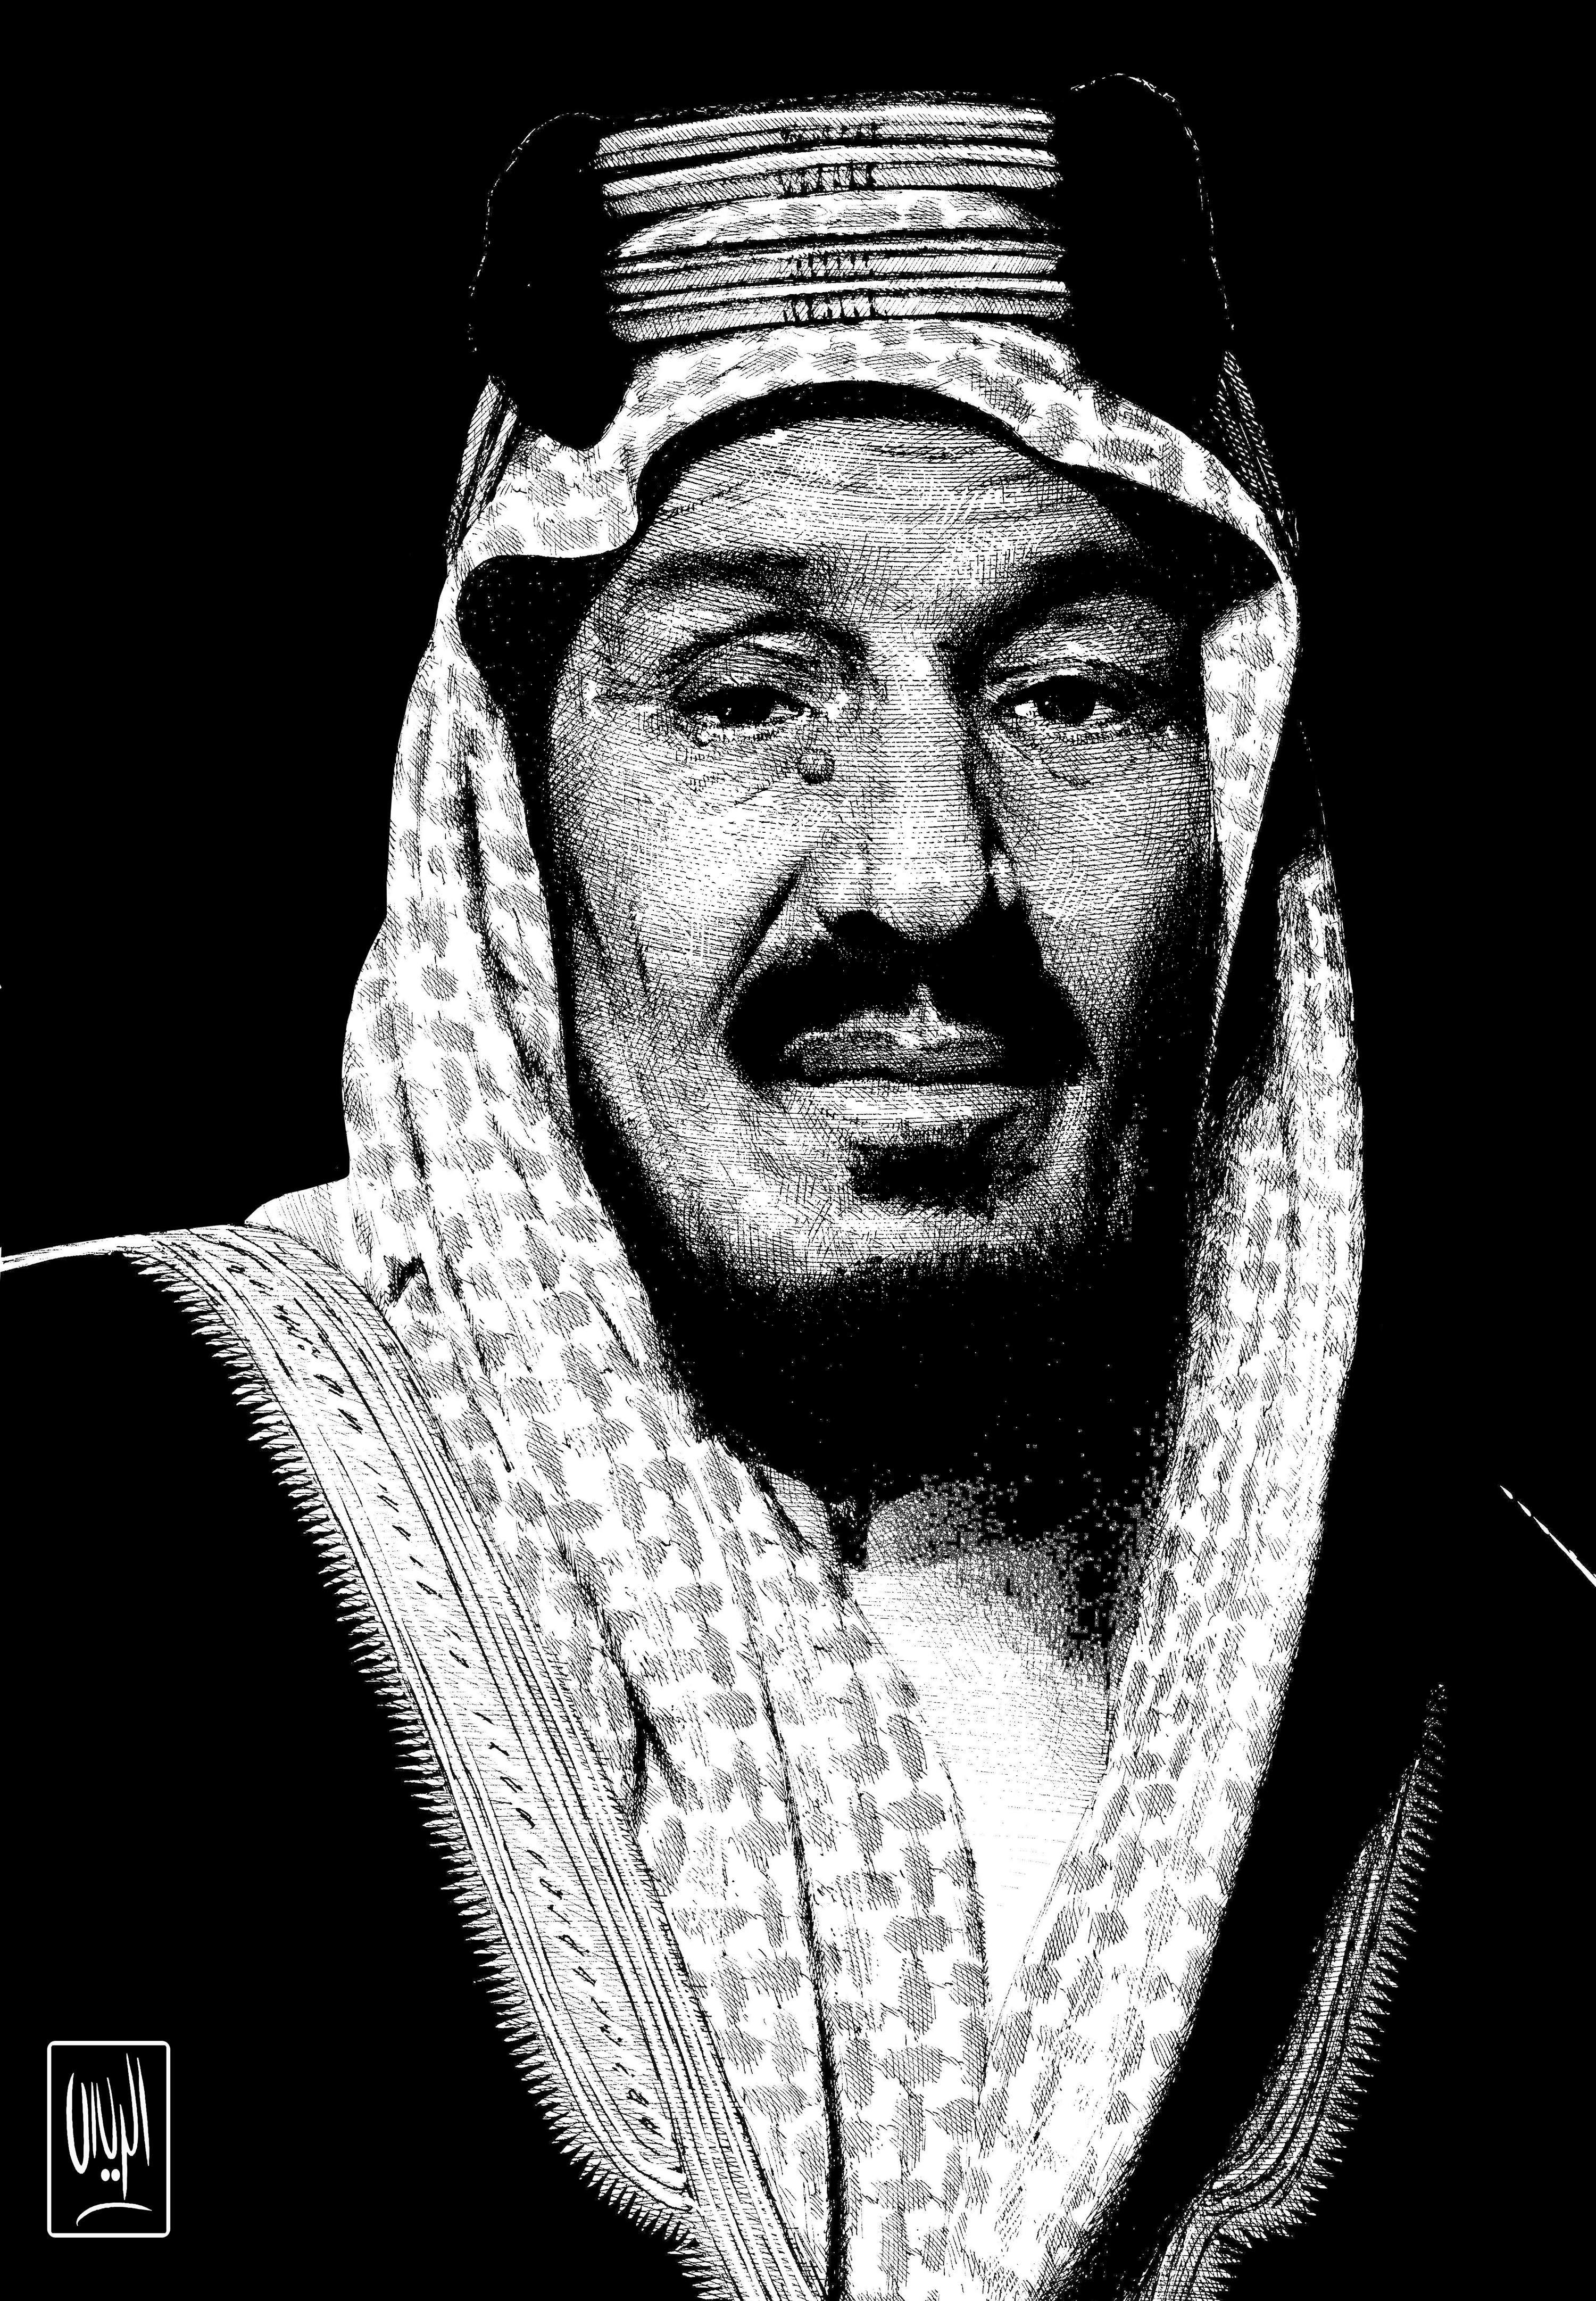 الملك عبدالعزيز حبر King Abdulaziz Ink Photo Awards Photography Inspiration Portrait Saudi Arabia Culture